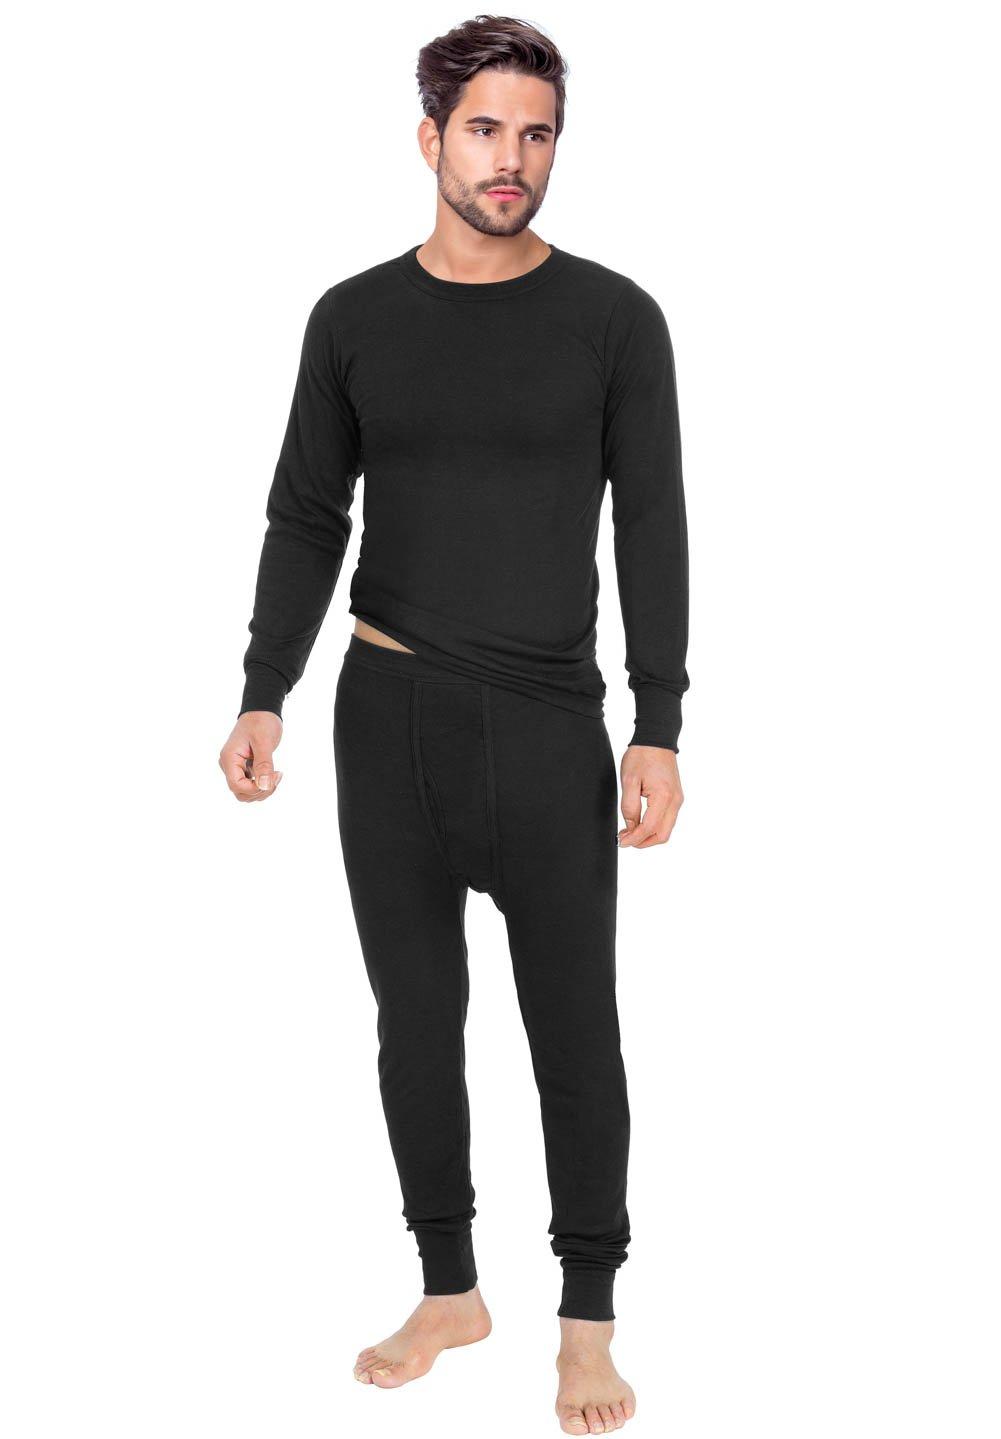 Rocky Men's Thermal 2pc Set Long John Underwear Smooth Knit (Xlarge, Black)